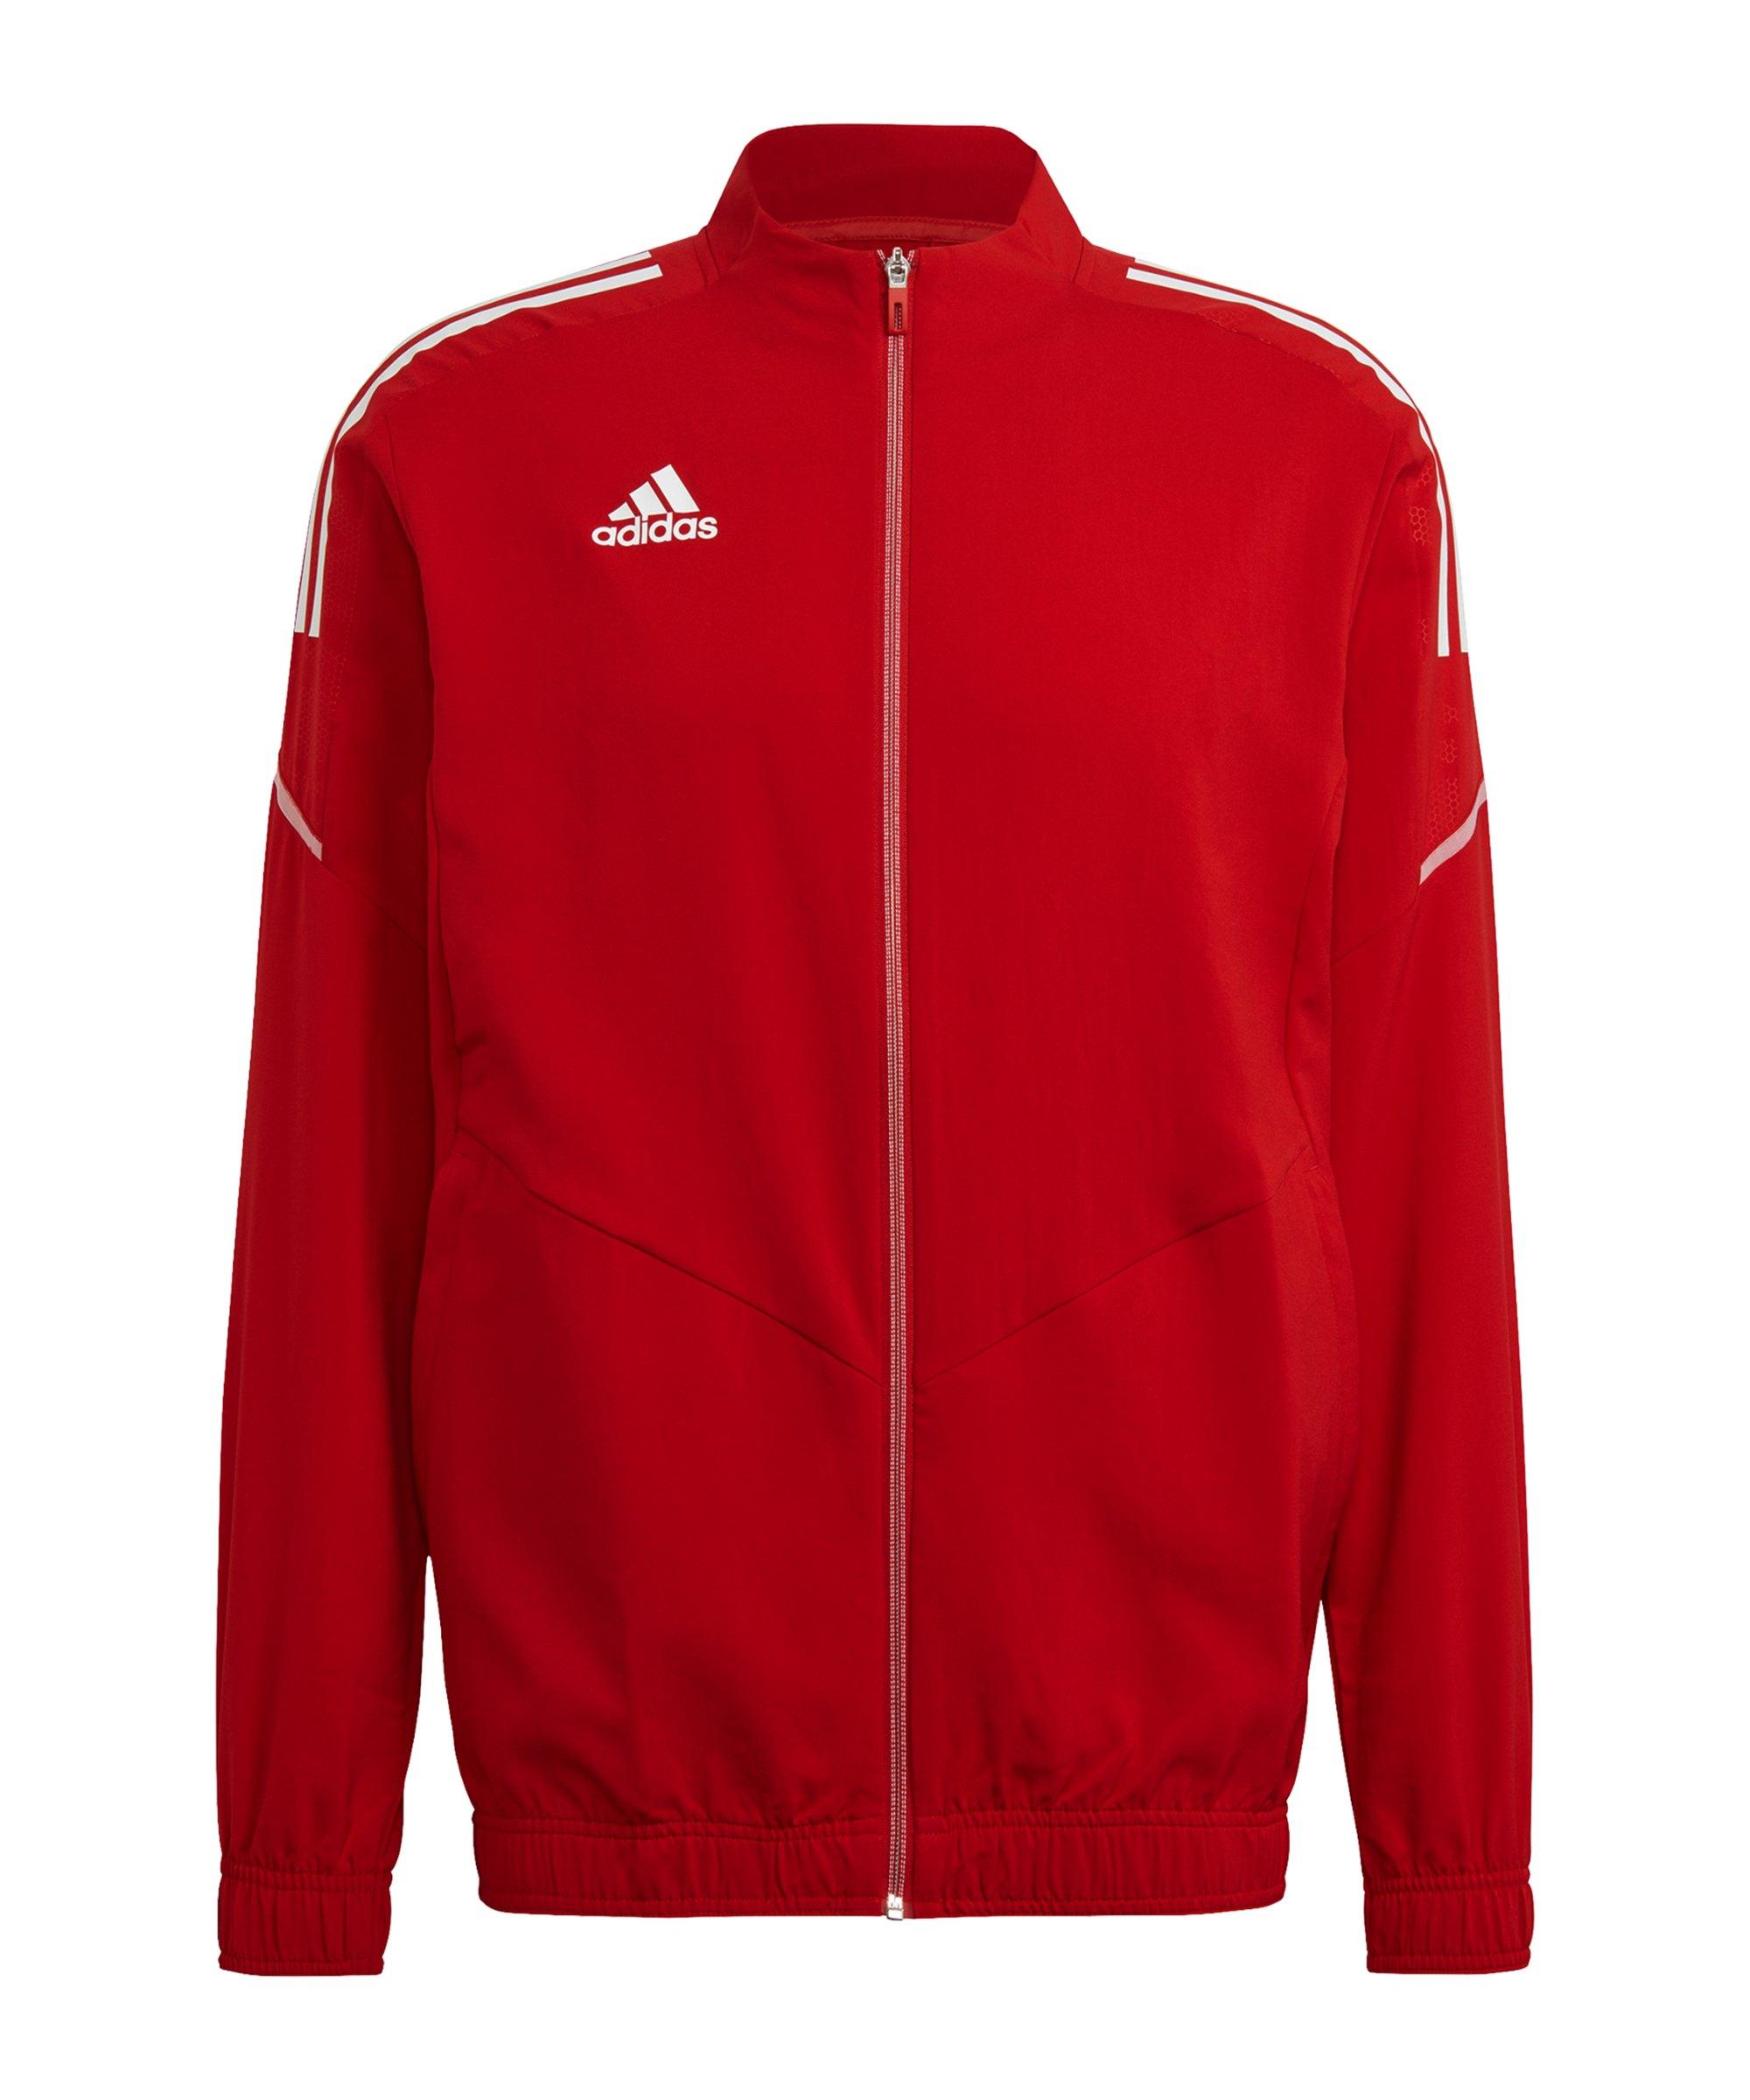 adidas Condivo 21 Präsentationsjacke Rot Weiss - rot